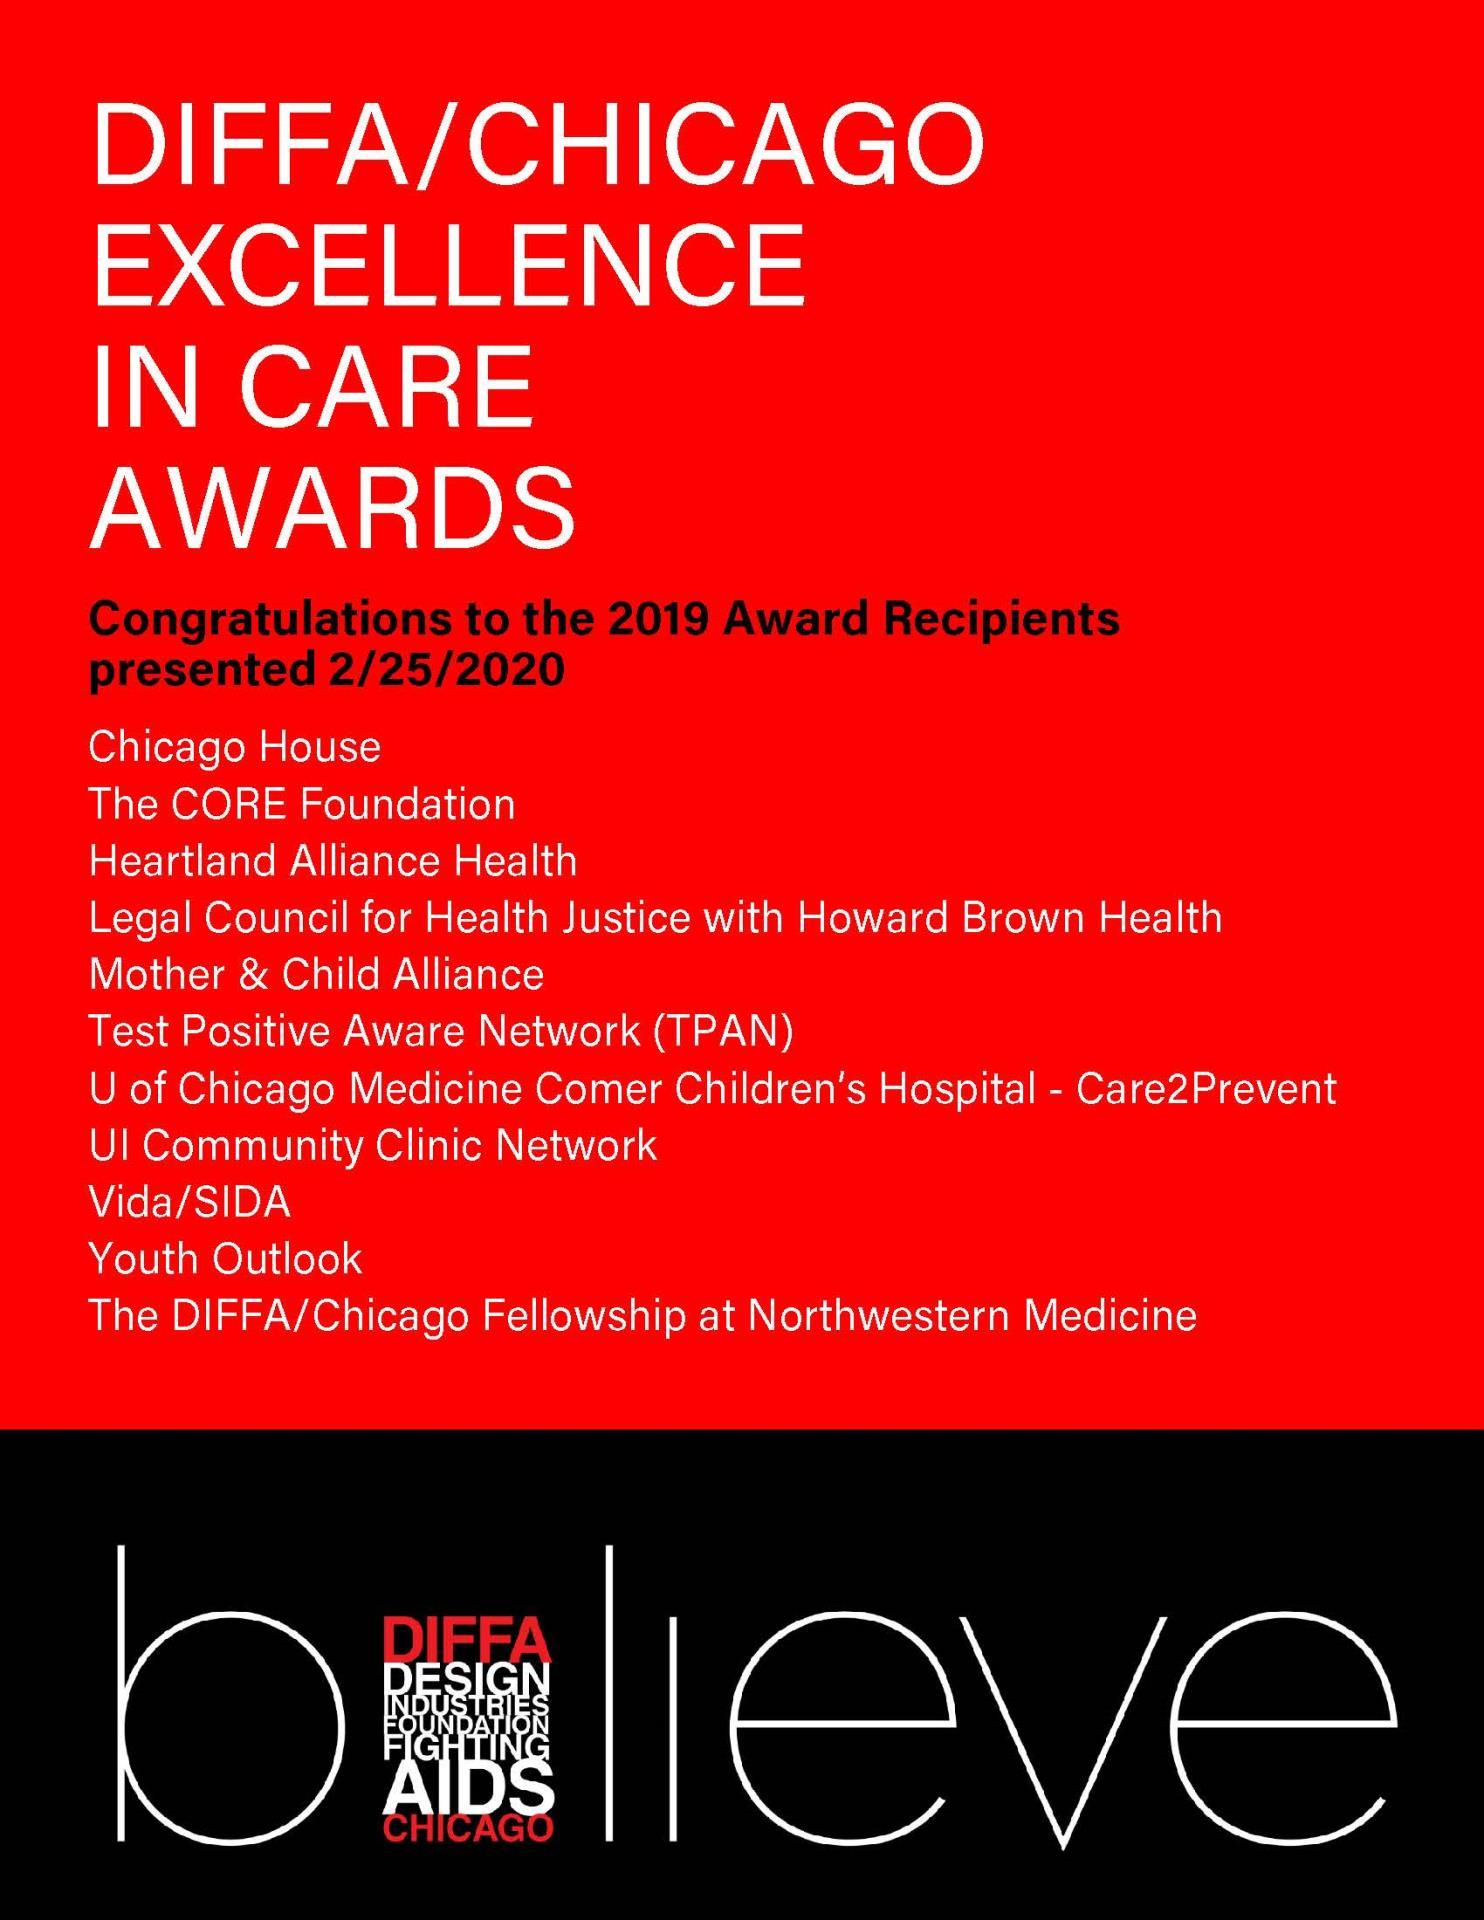 DIFFA/Chicago Announces Excellence in Care Recipients